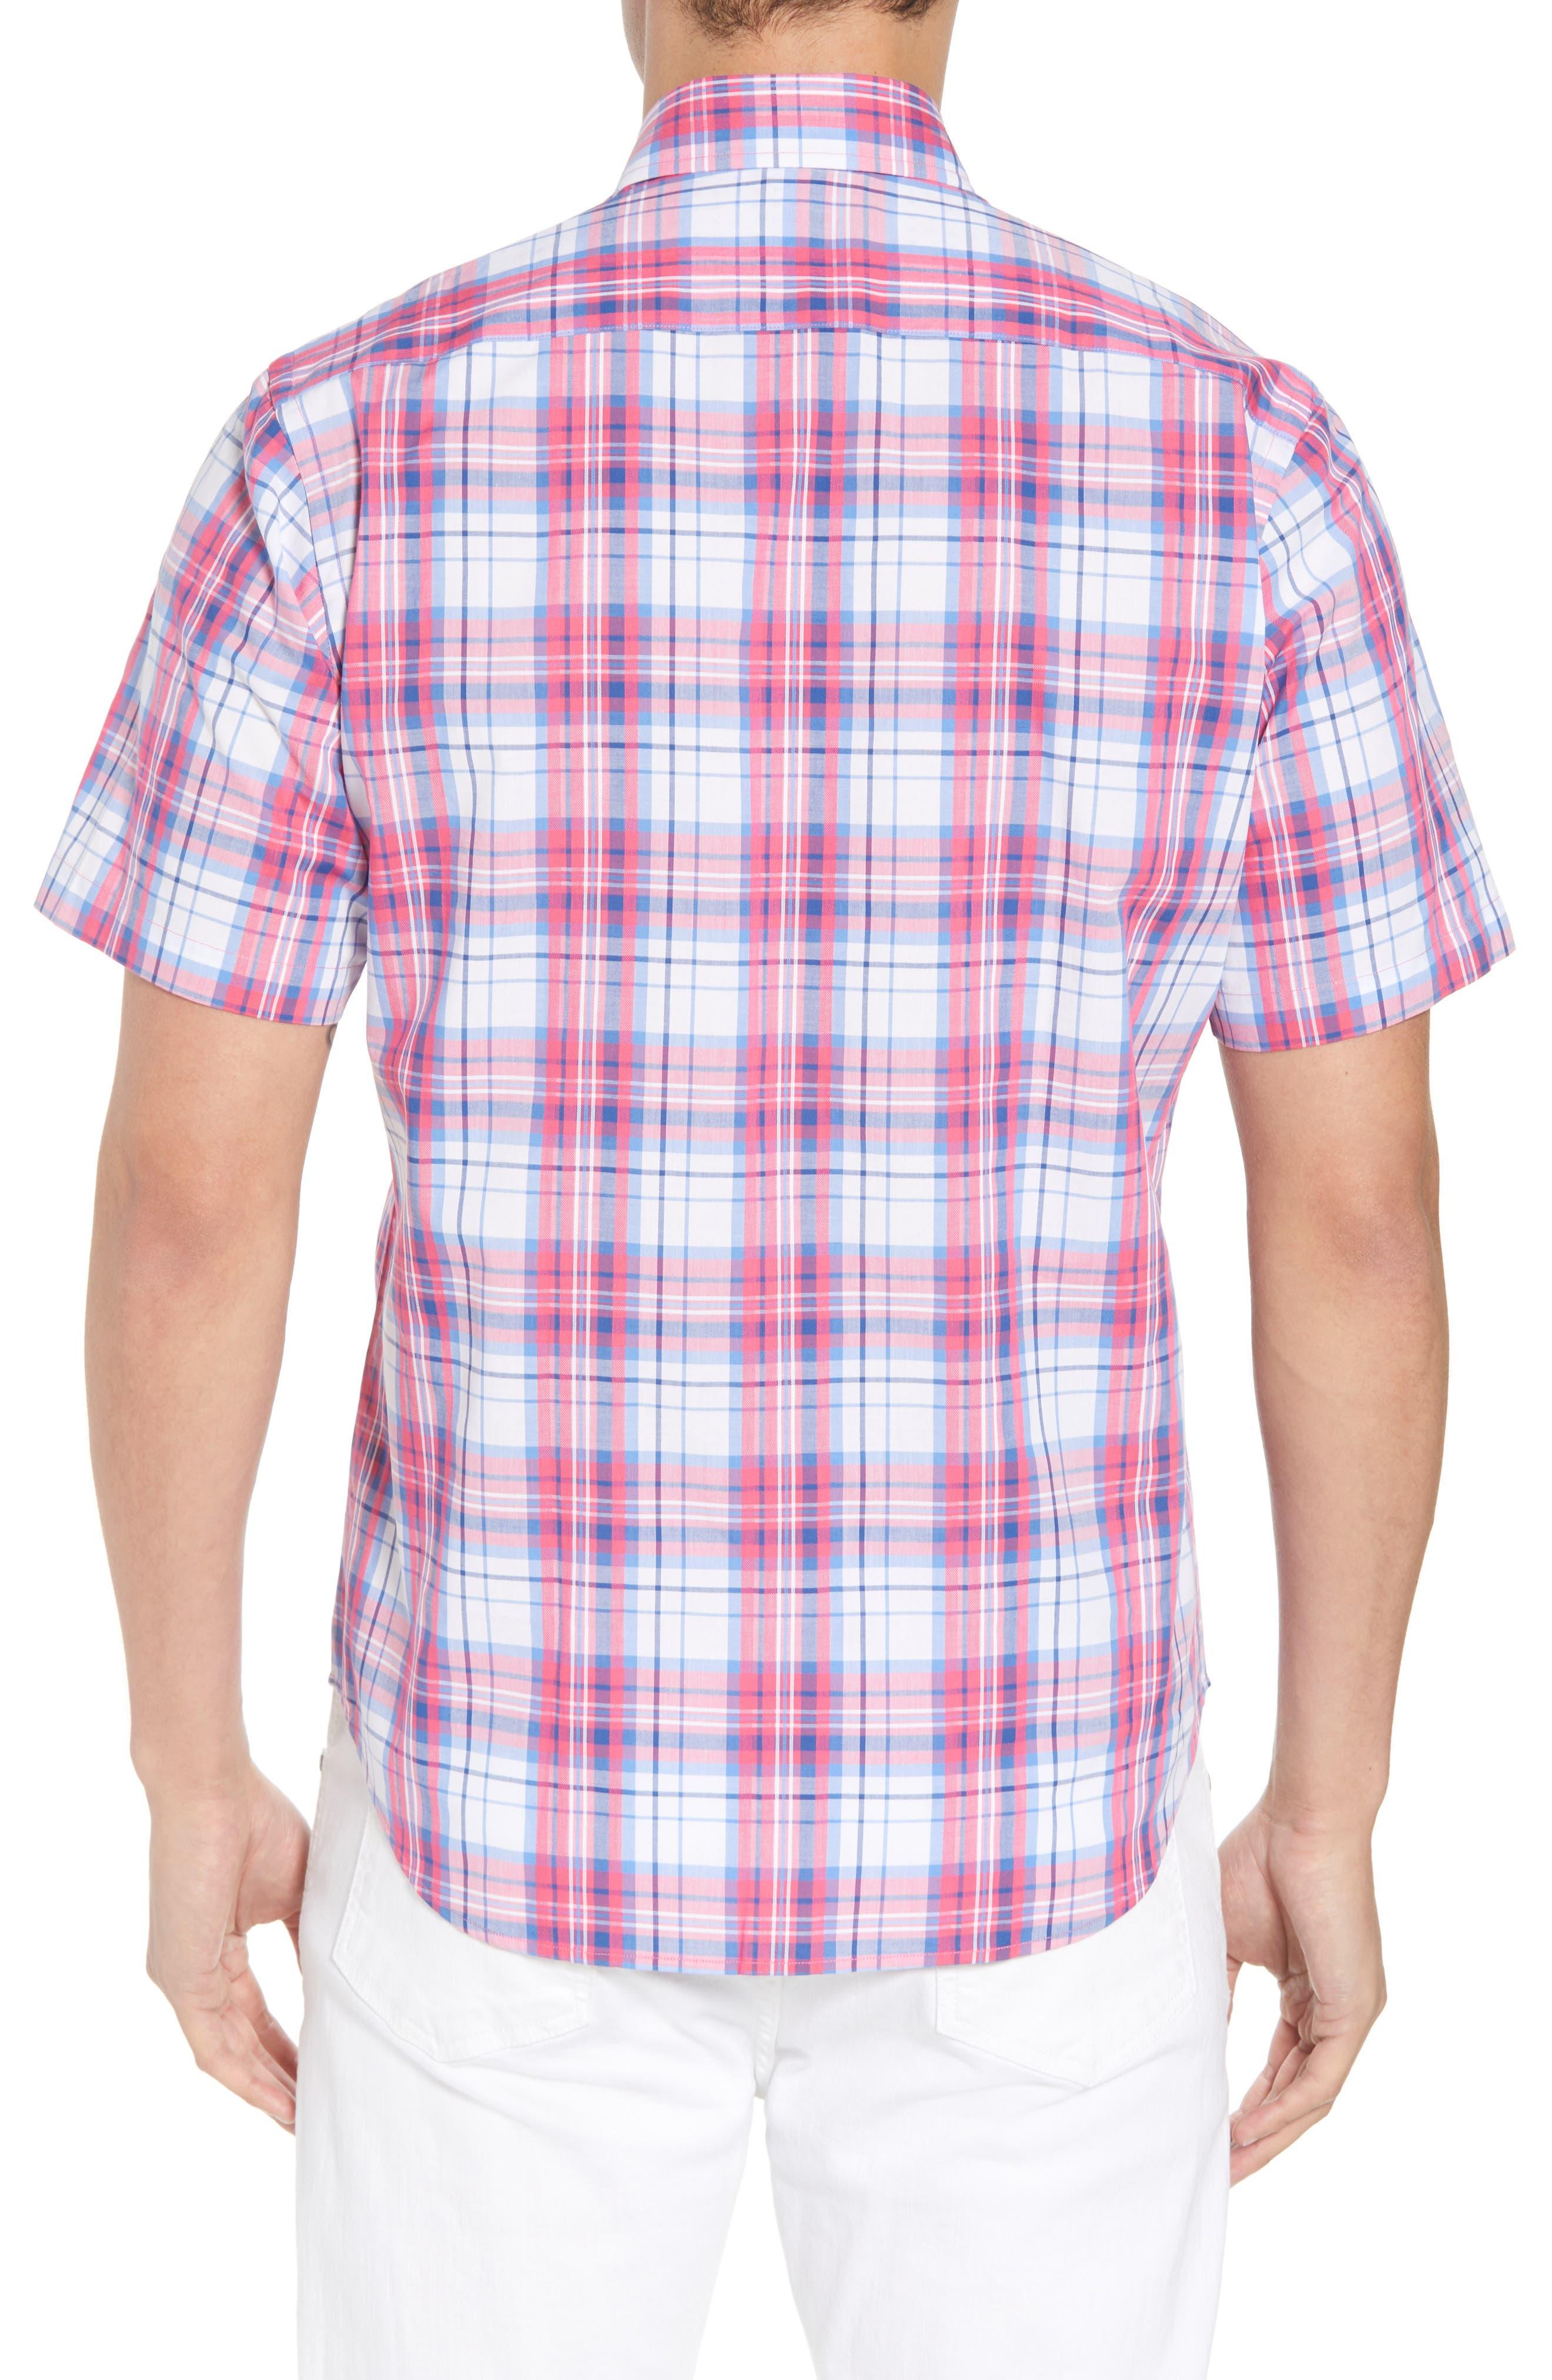 Alesso Regular Fit Plaid Sport Shirt,                             Alternate thumbnail 2, color,                             950